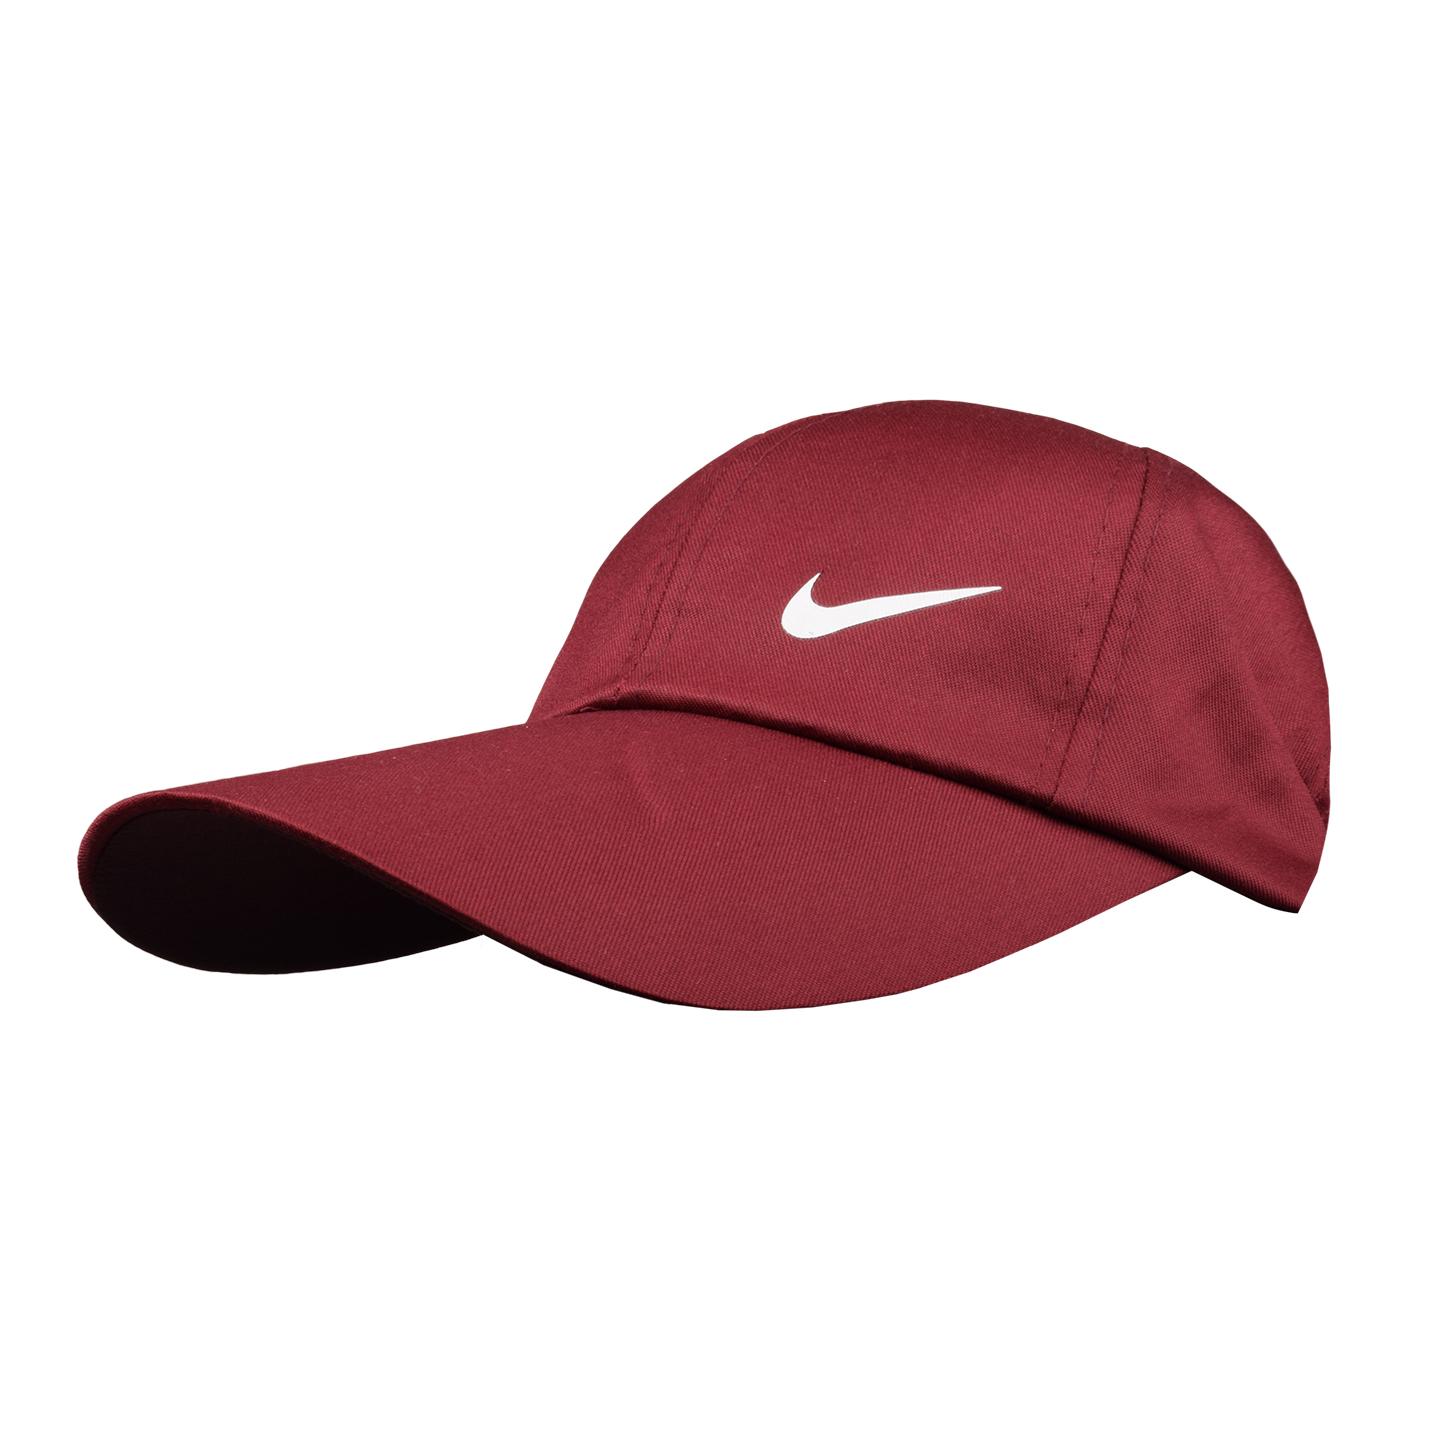 قیمت کلاه کپ مدل NK1051